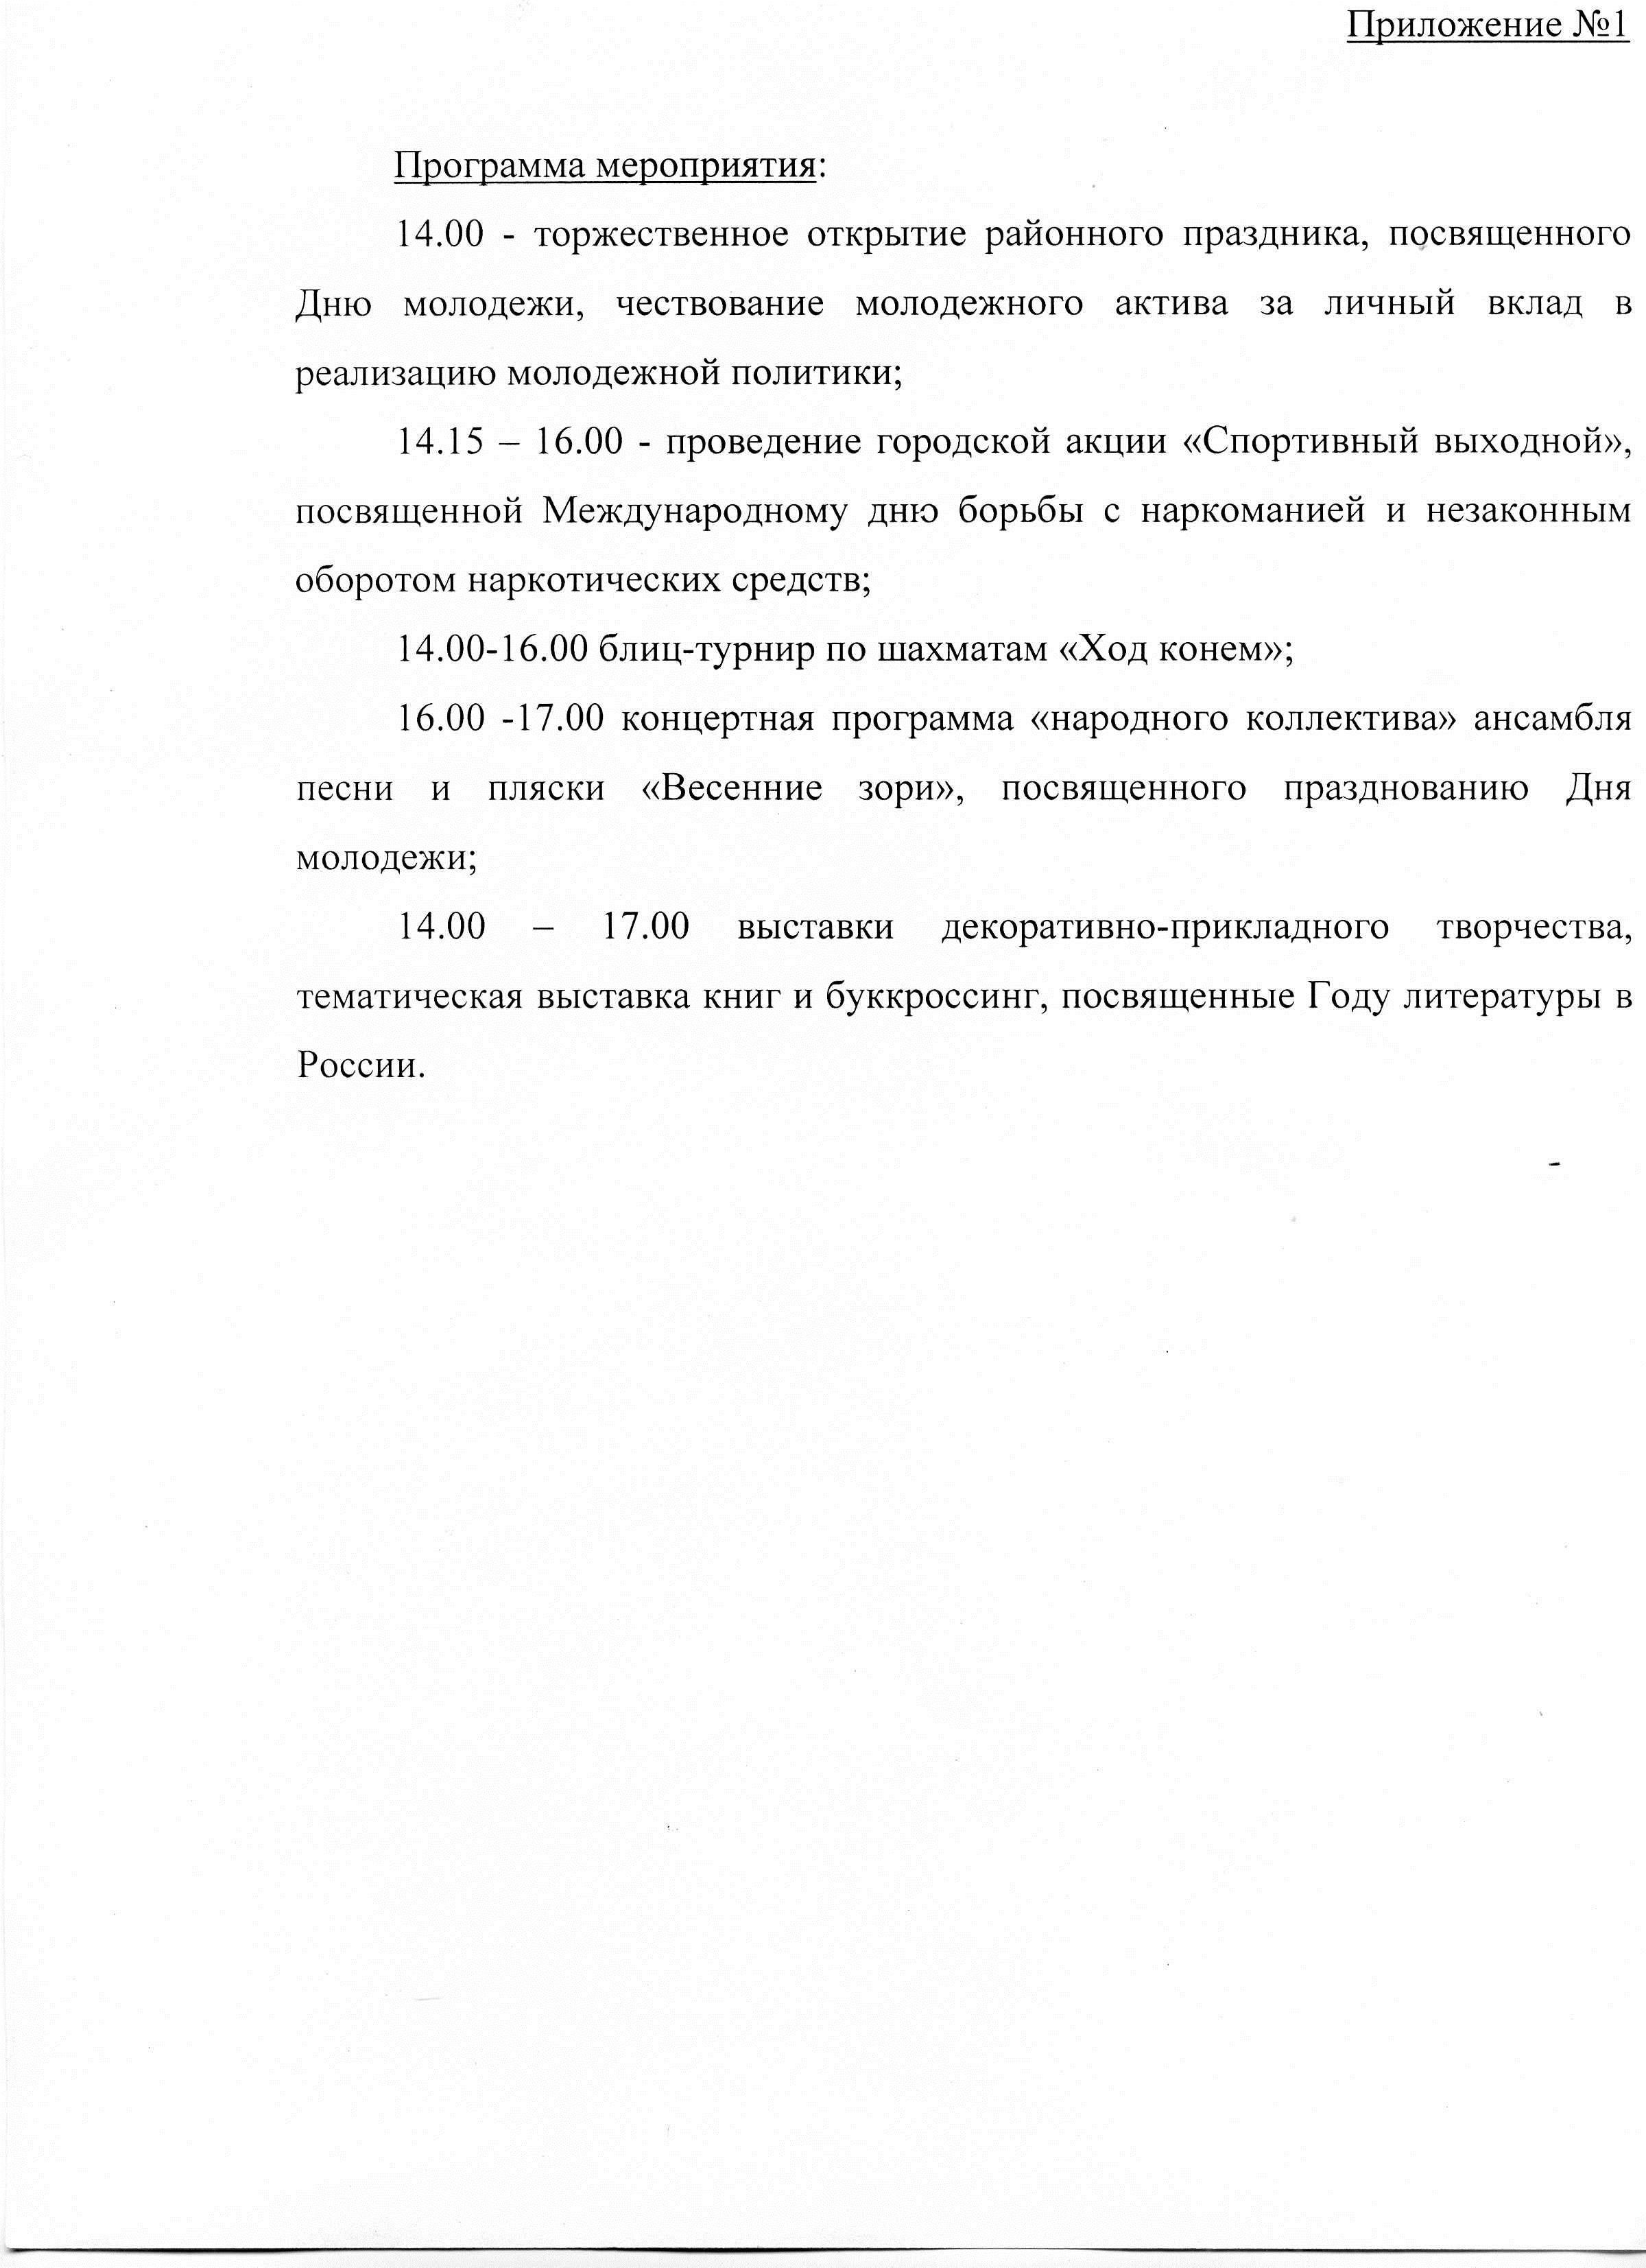 http://sg.uploads.ru/7acr4.jpg